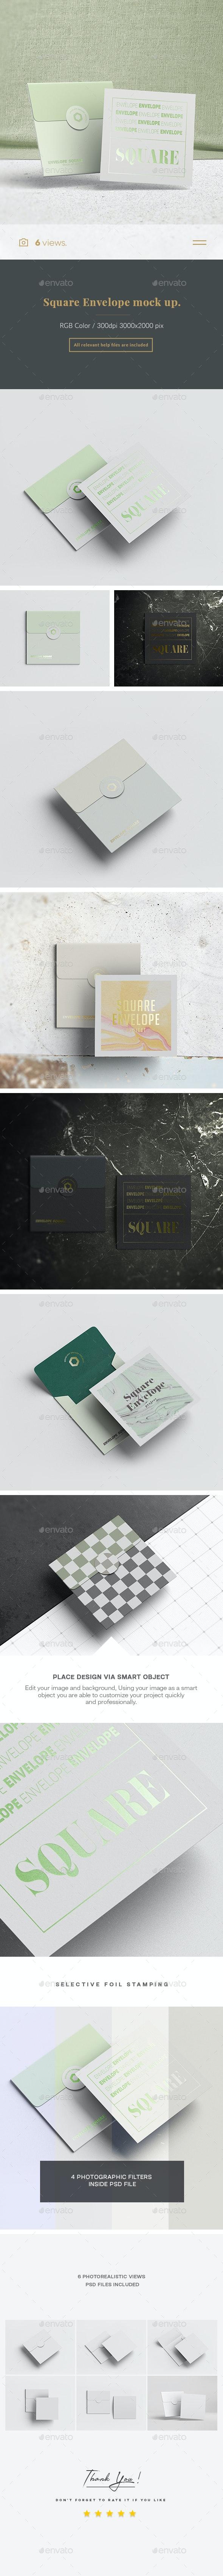 Square Envelope Mock-up - Product Mock-Ups Graphics